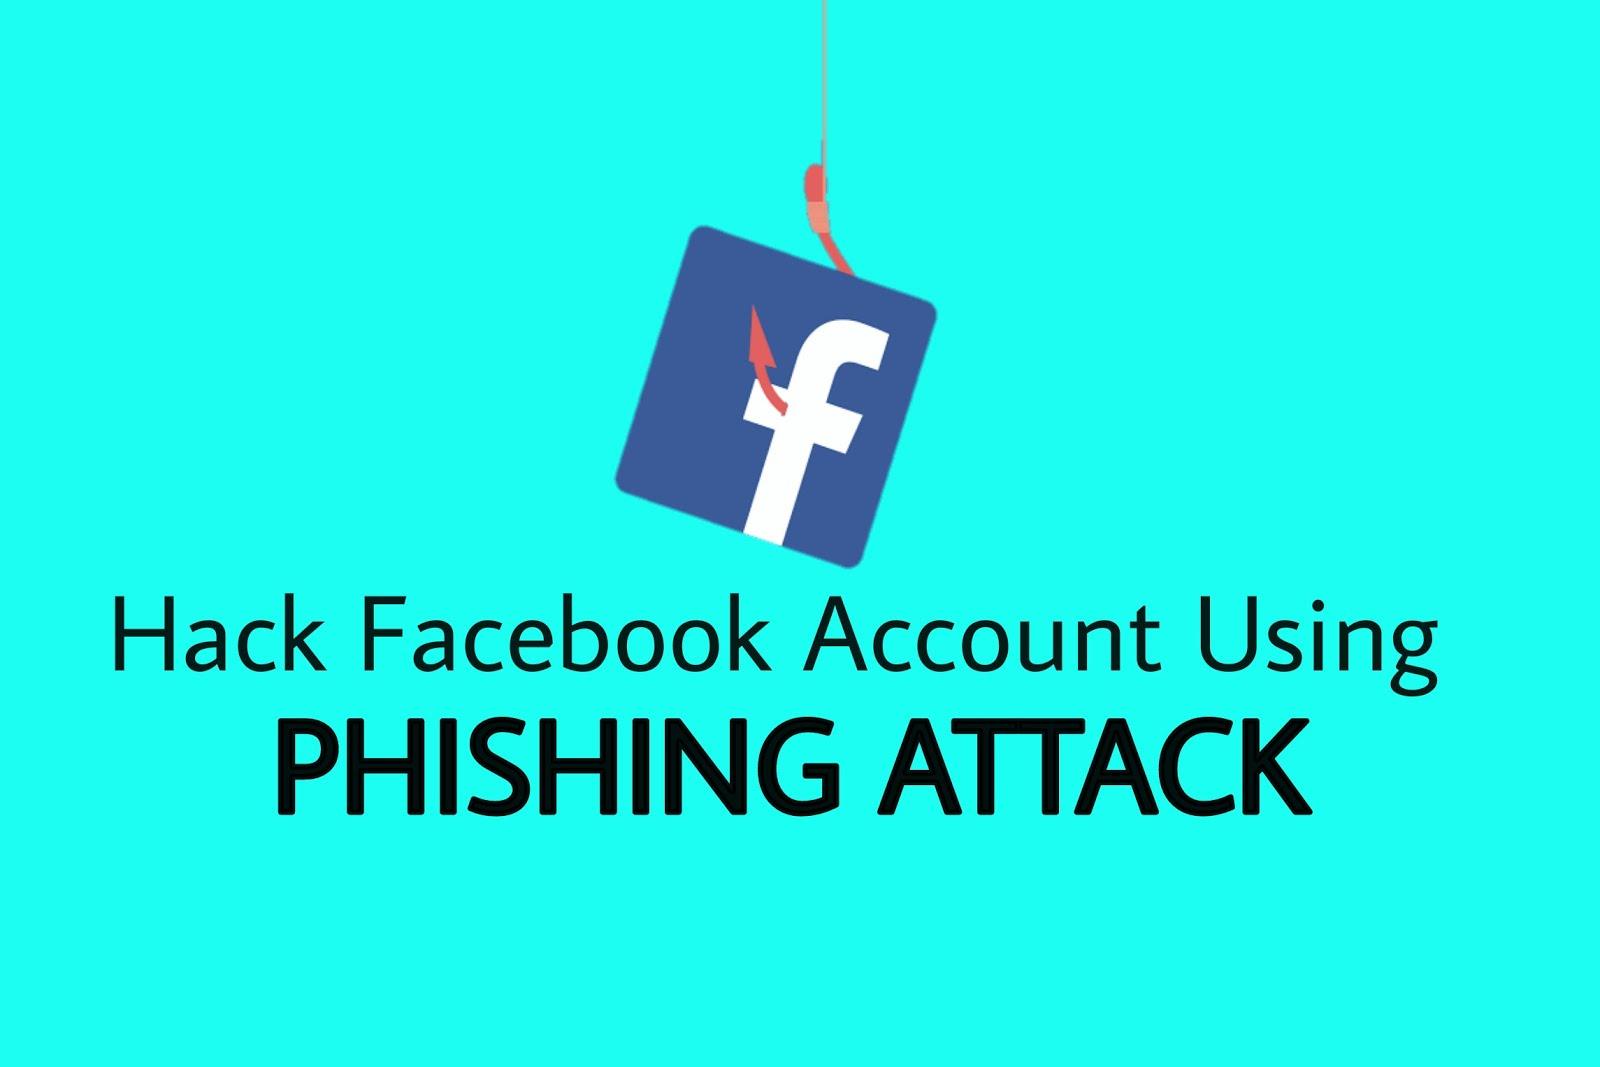 Hack Facebook Account using Phishing Attack